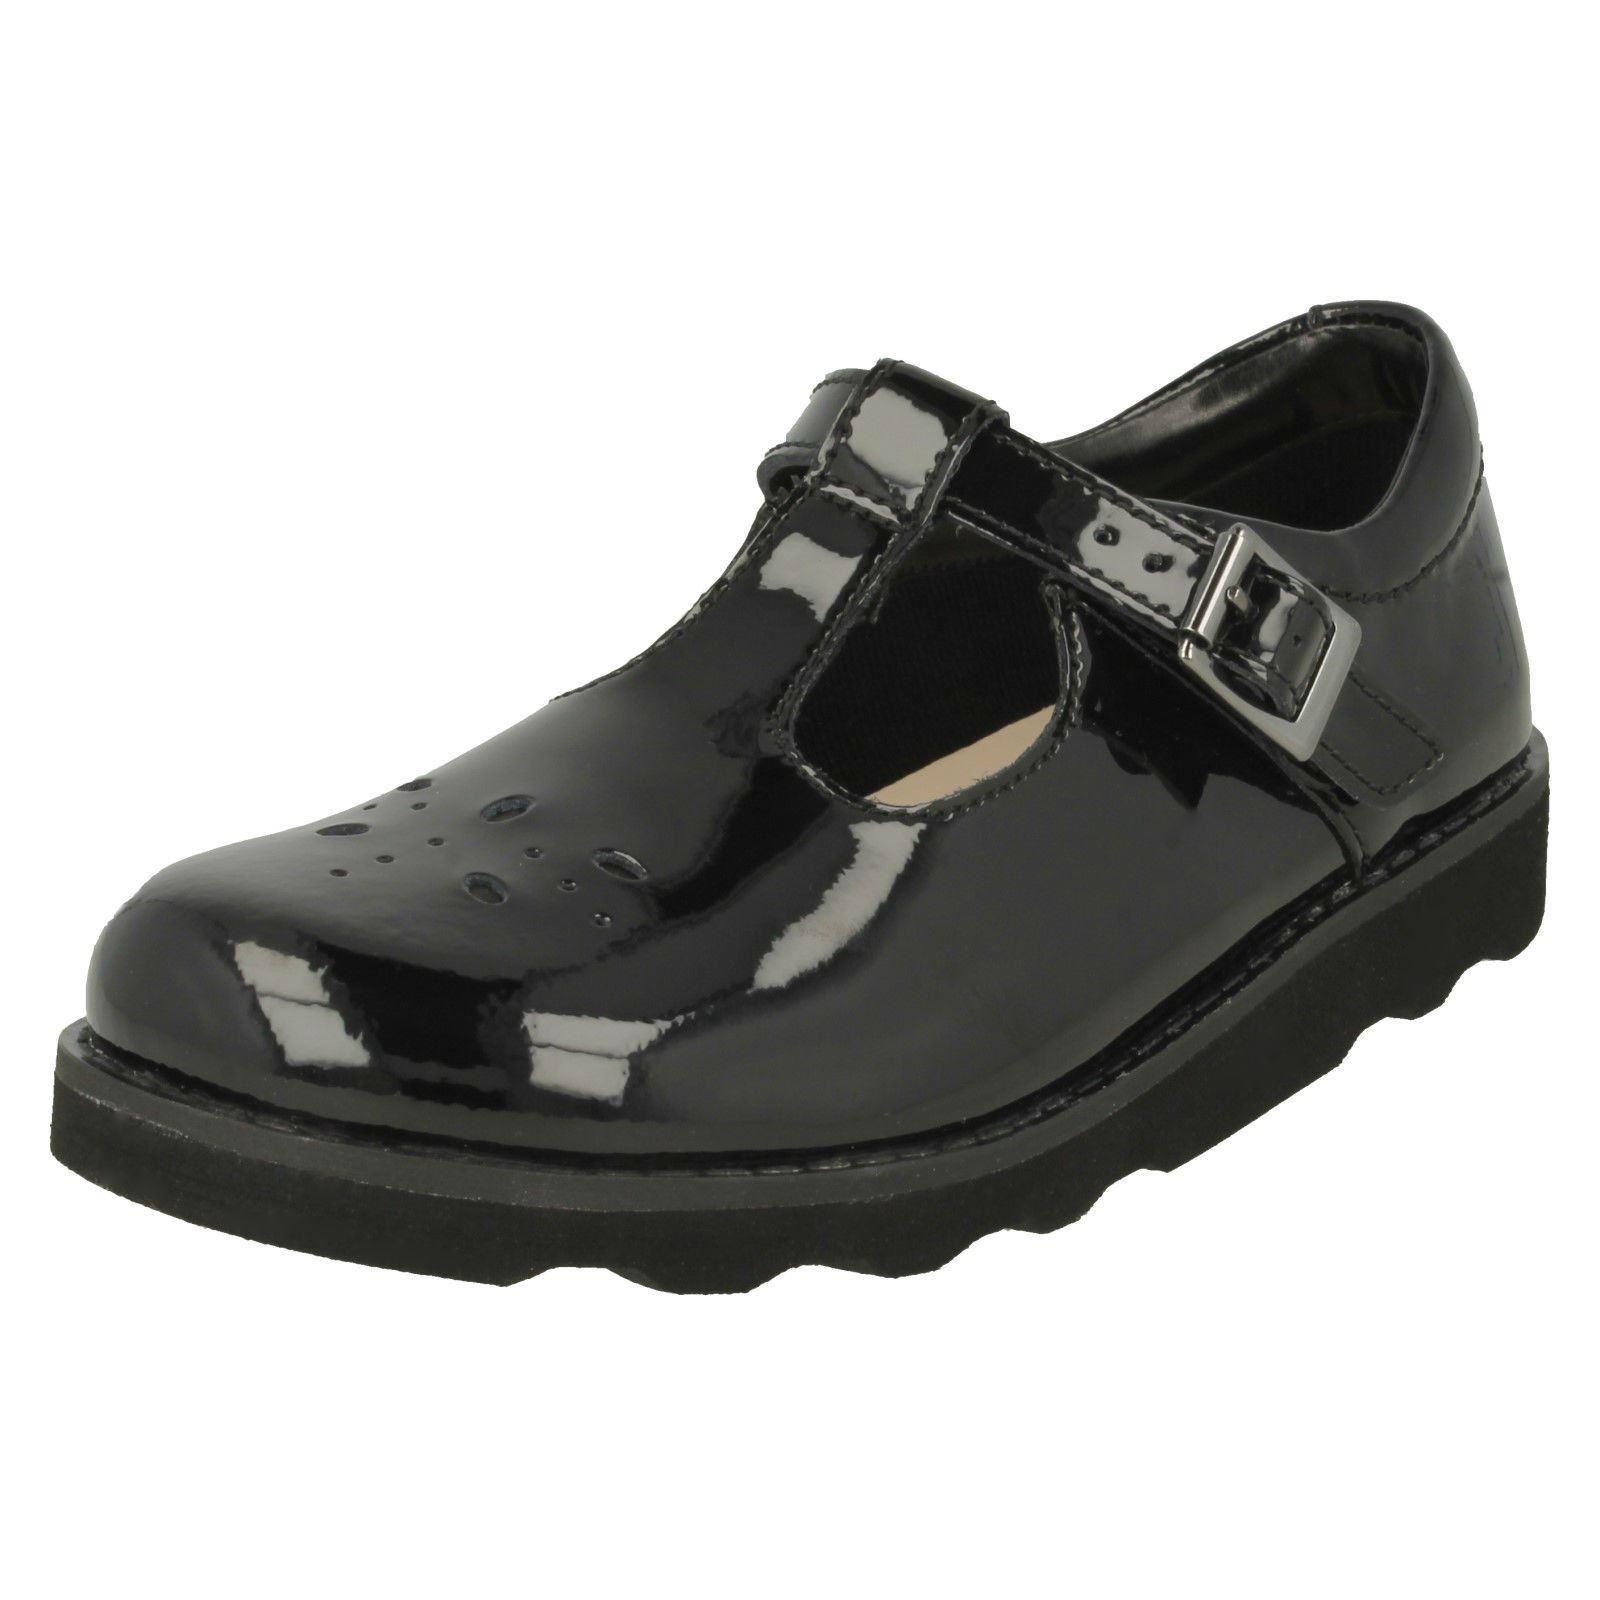 8857d35f Chicas Clarks Classic TBar Zapatos coronas deseo